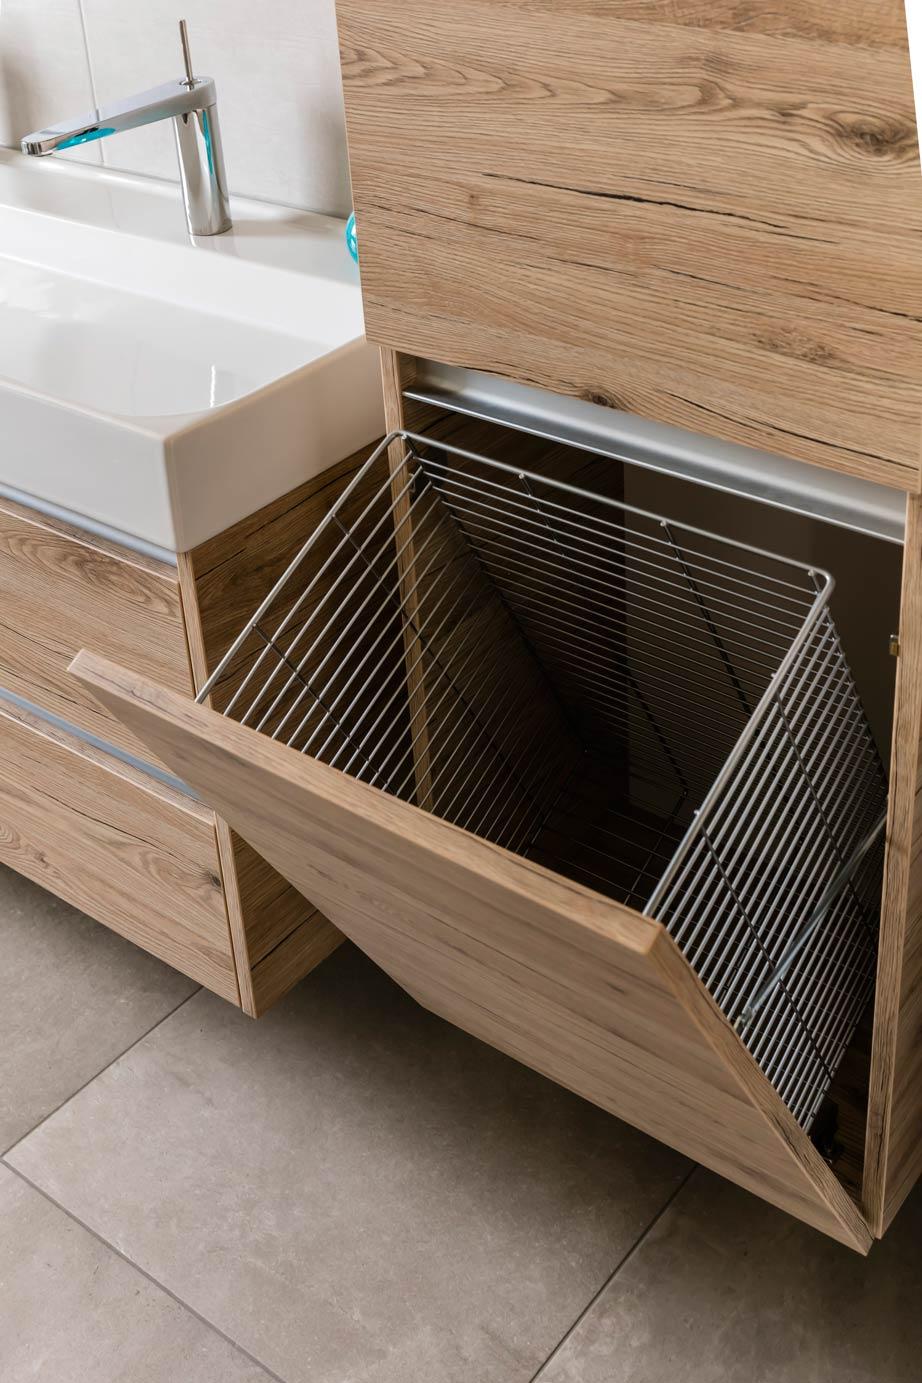 Goedkope Wasbak Badkamer : Badkamer kopen in ermelo lees klantervaring arma